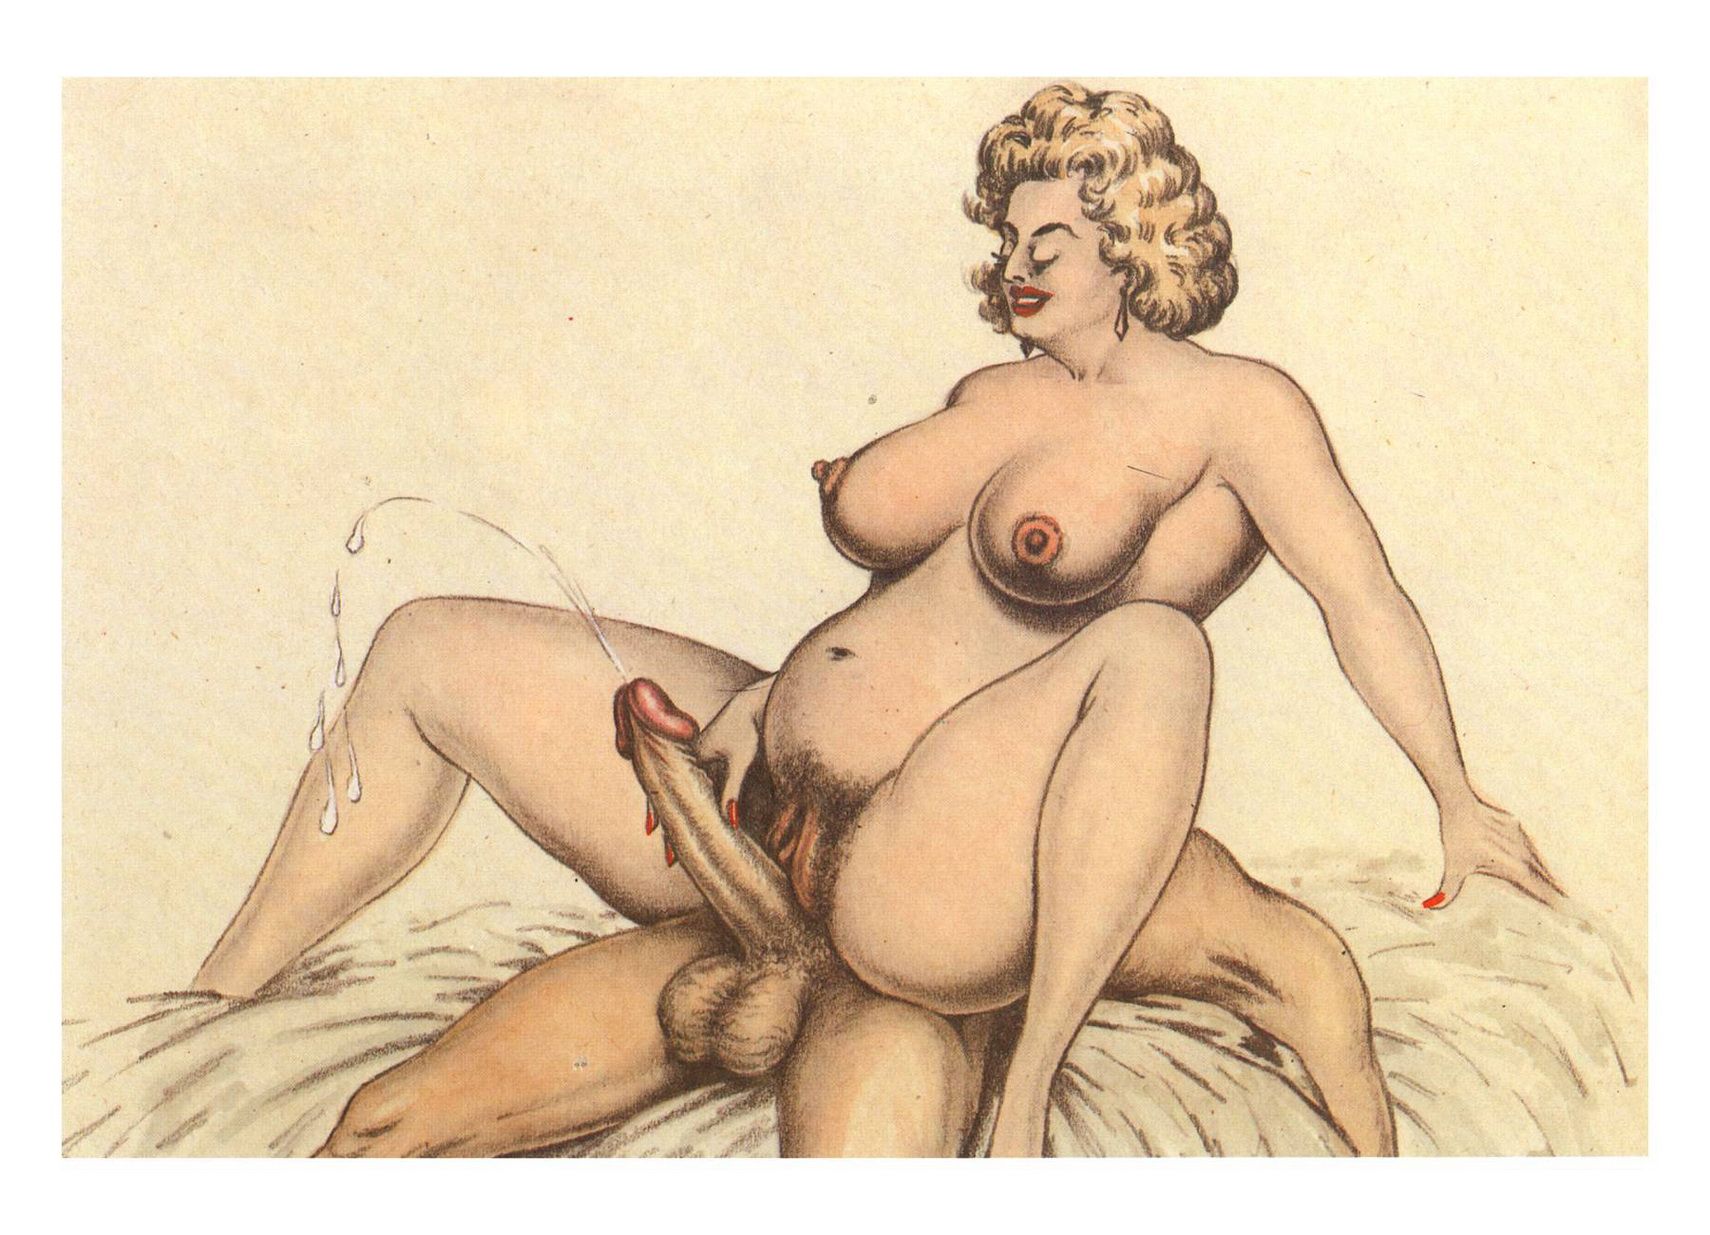 Vintage erotic cartoon gallery